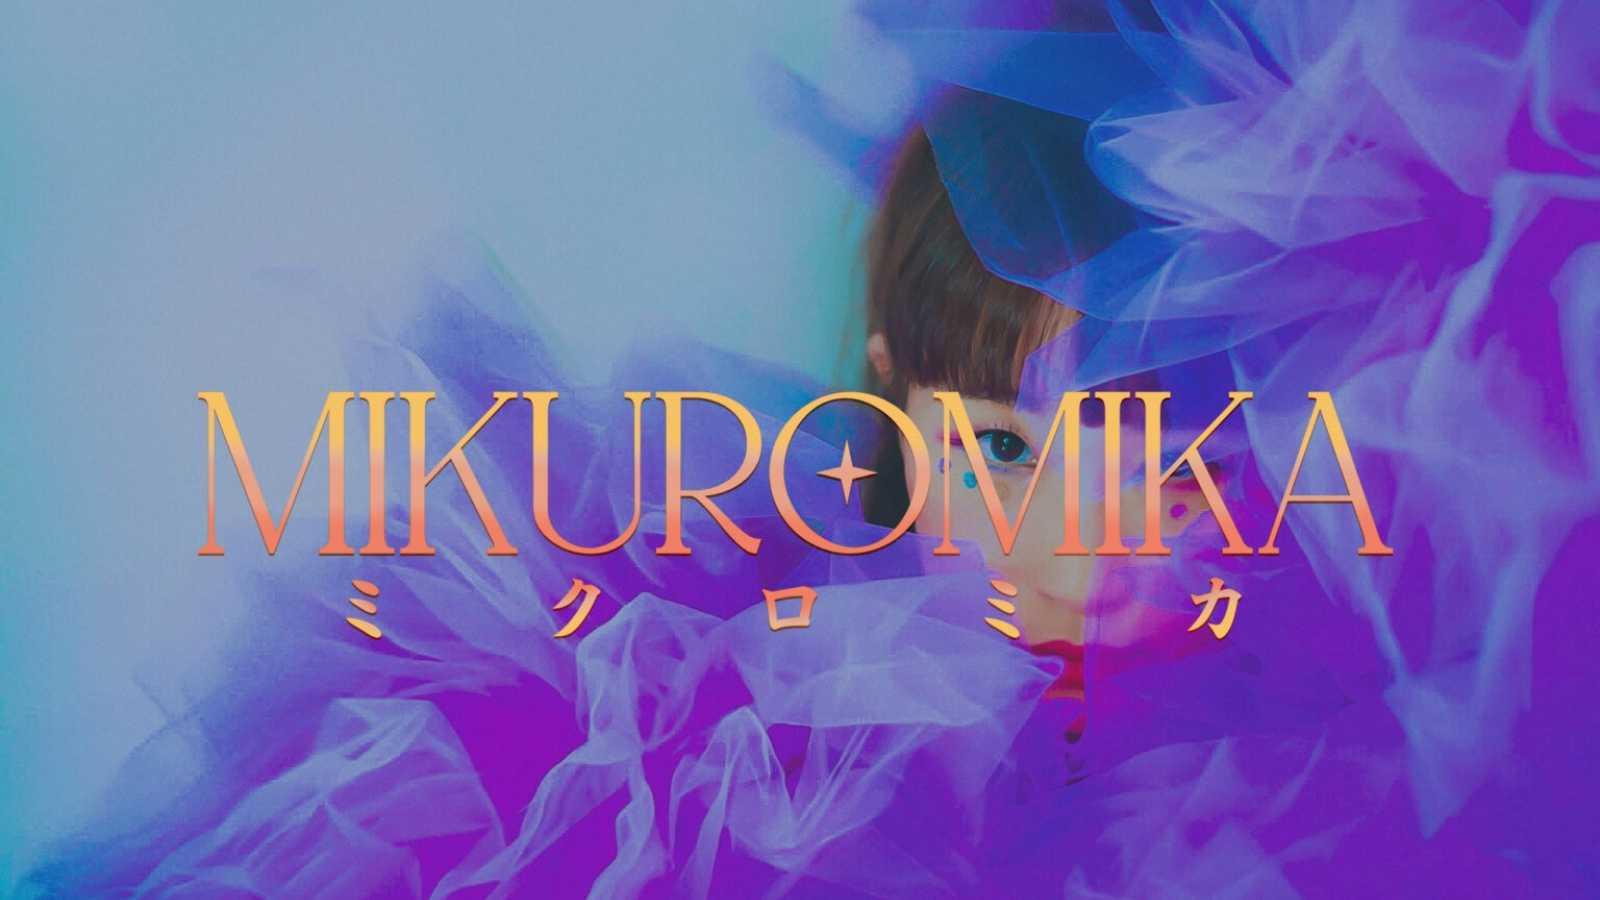 MIKUROMIKA © MIKUROMIKA. All rights reserved.